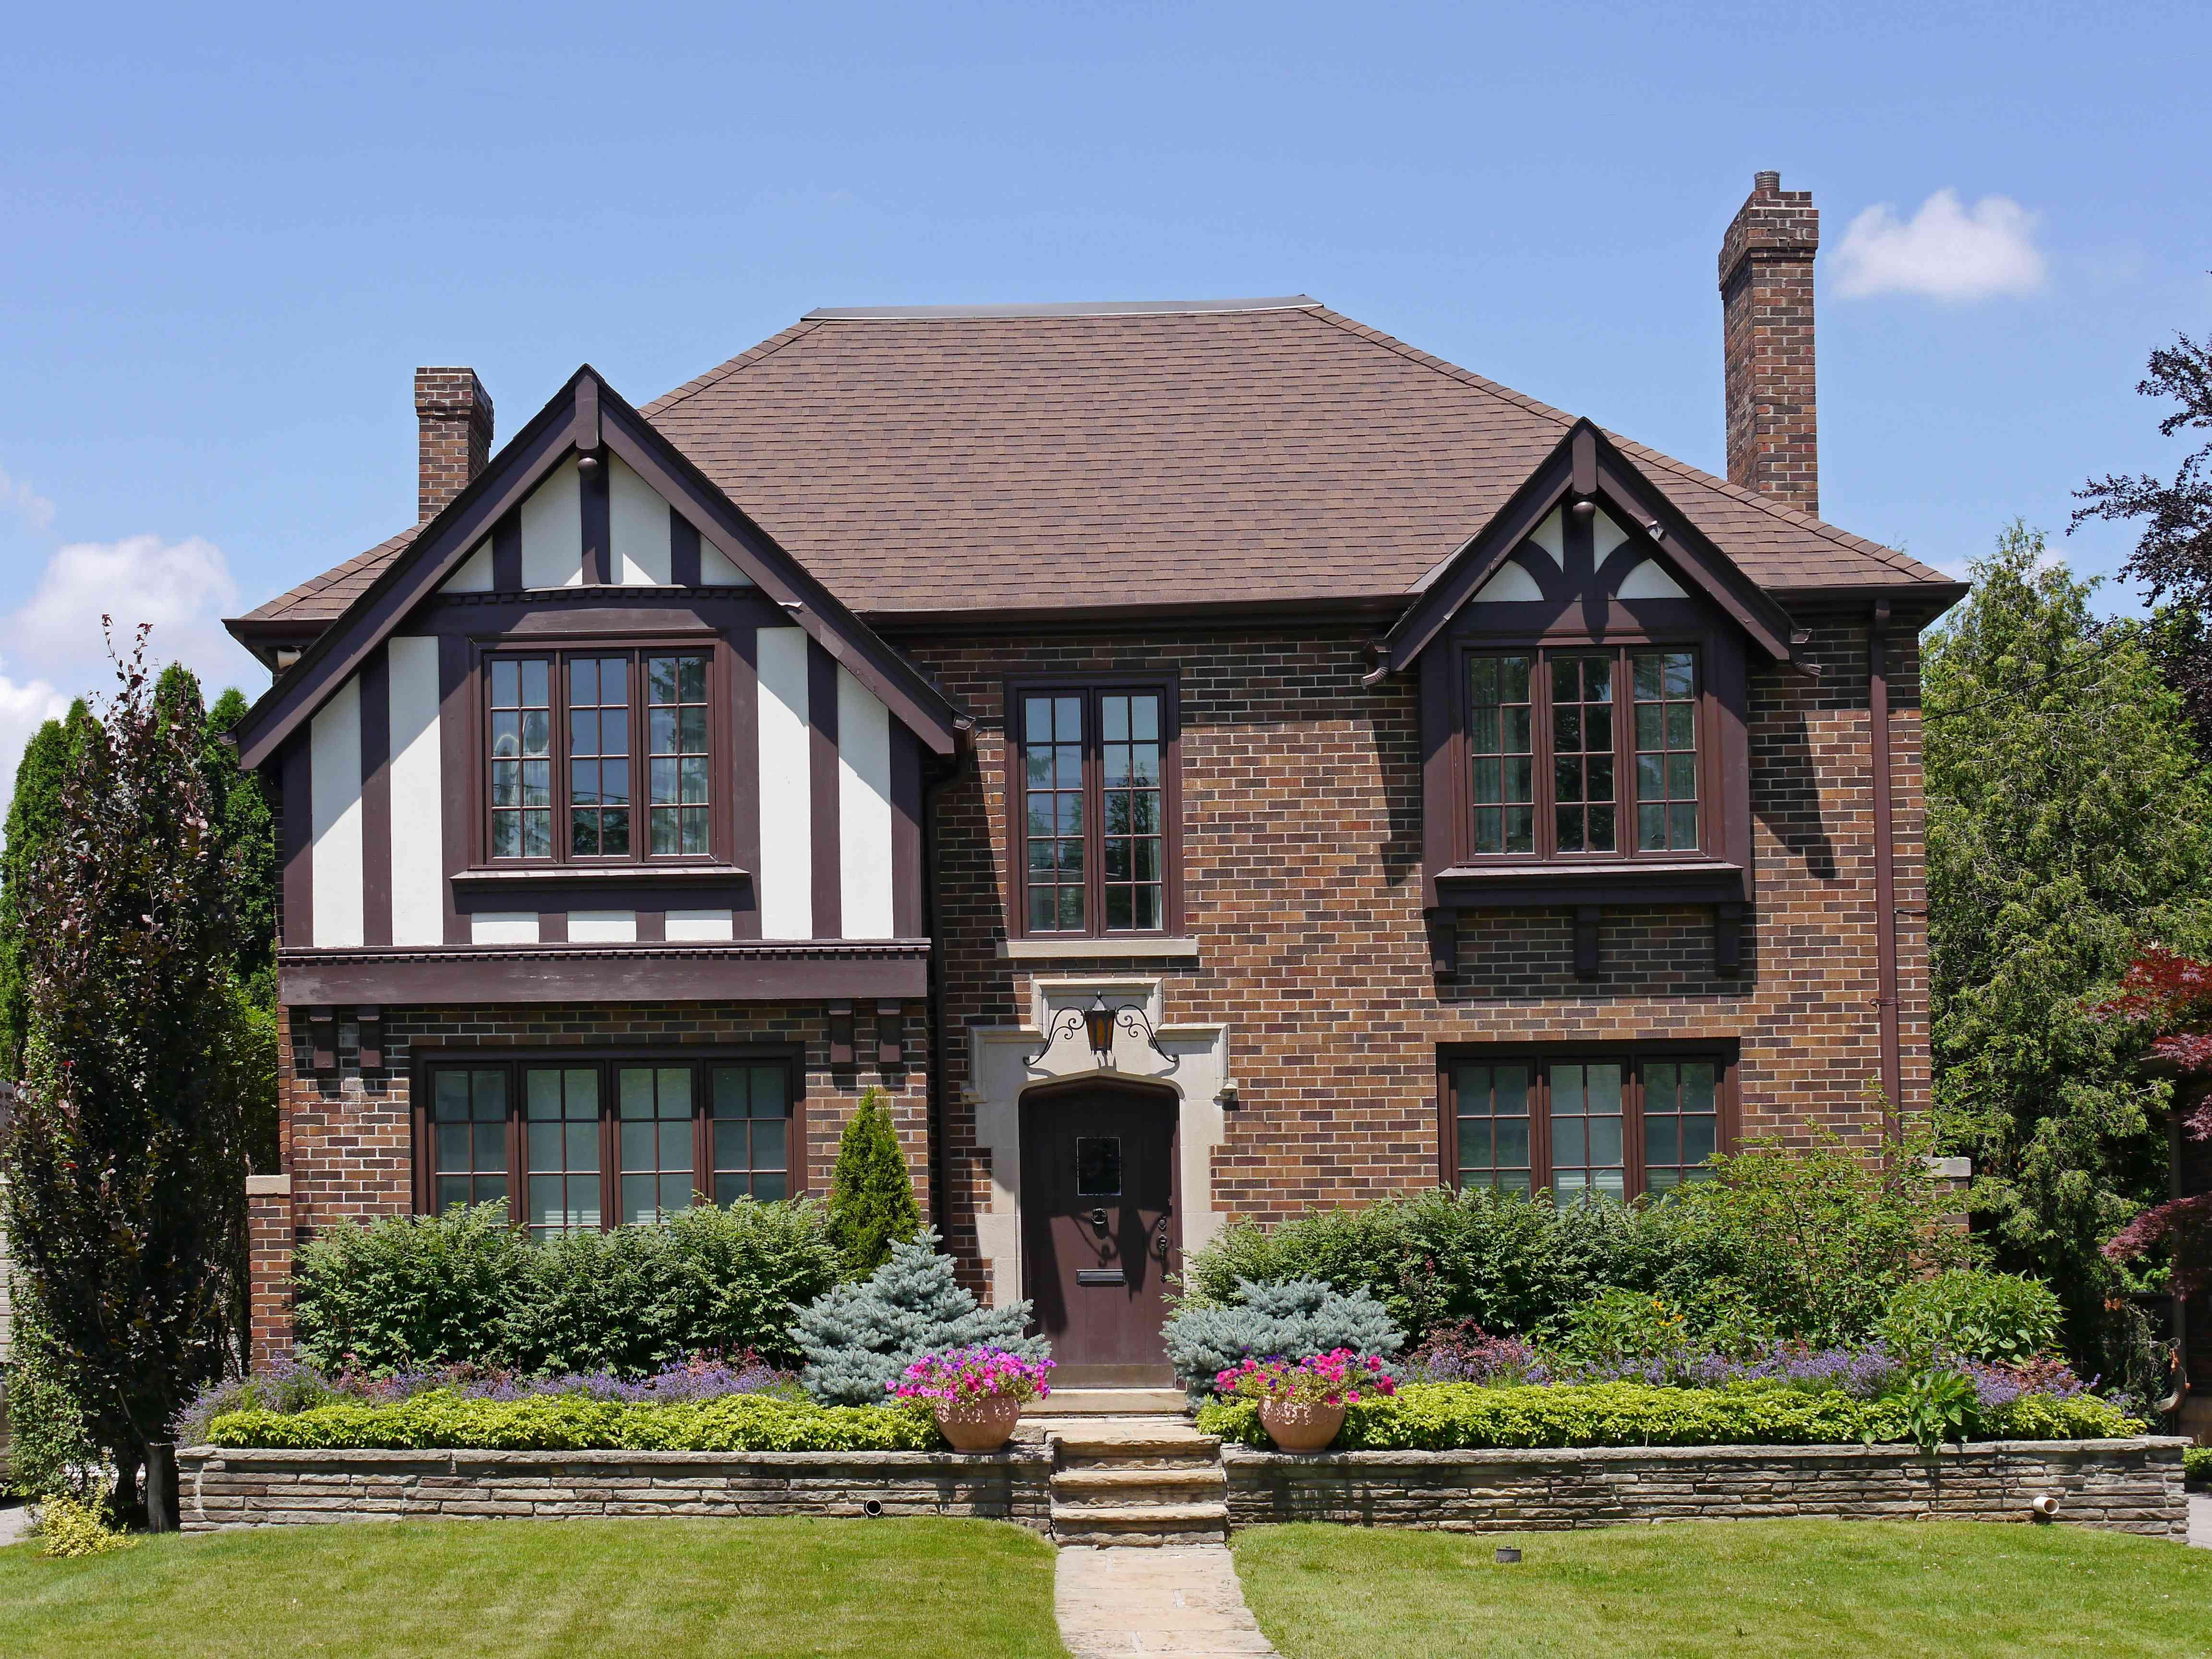 Tudor style brick house